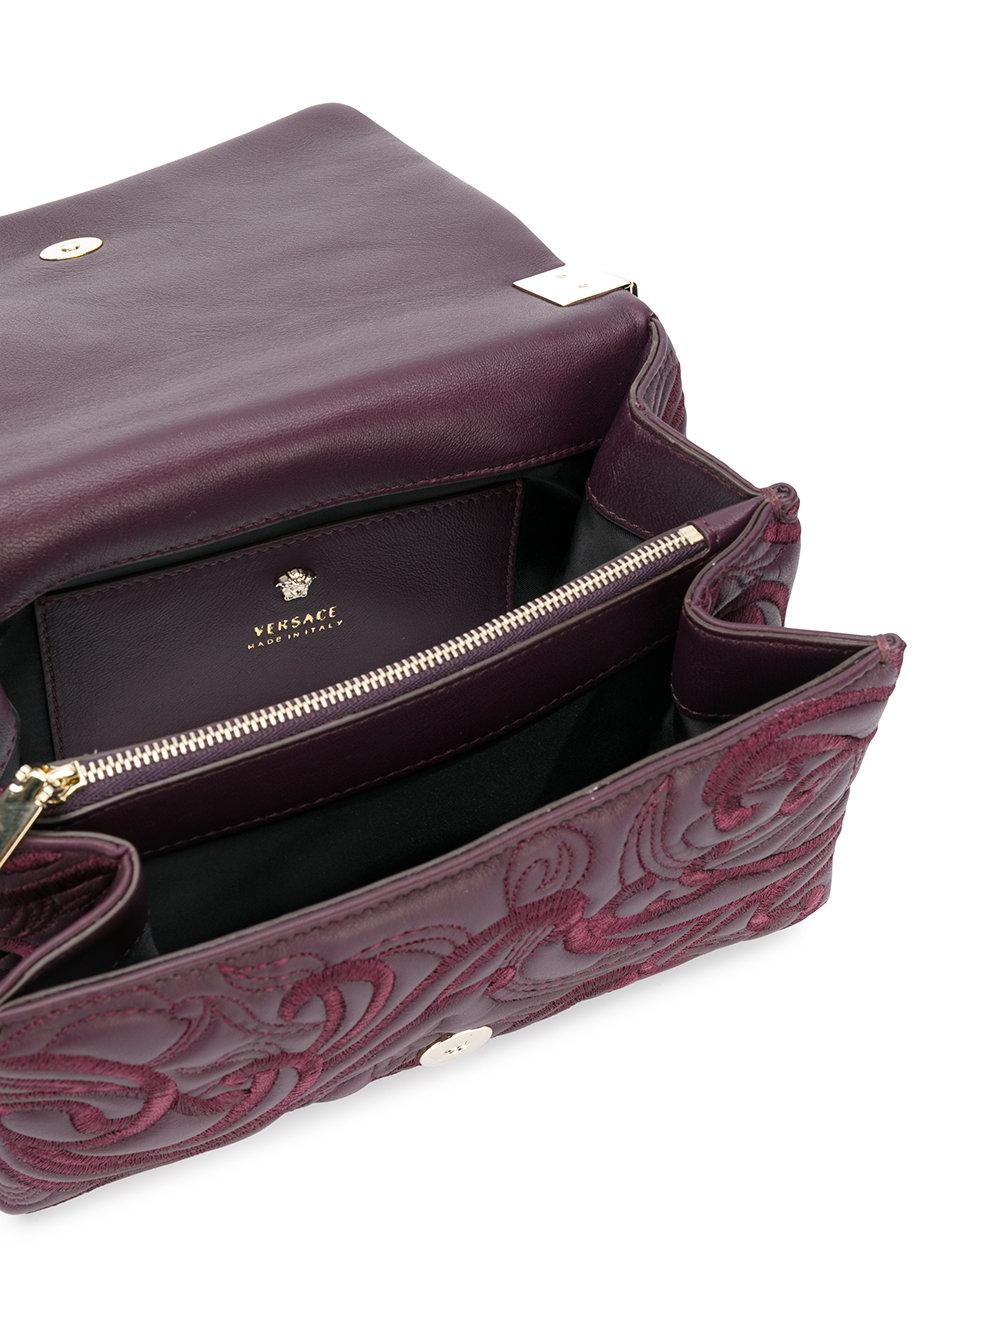 0c9f7b648fb Versace Sultan Bag in Purple - Lyst